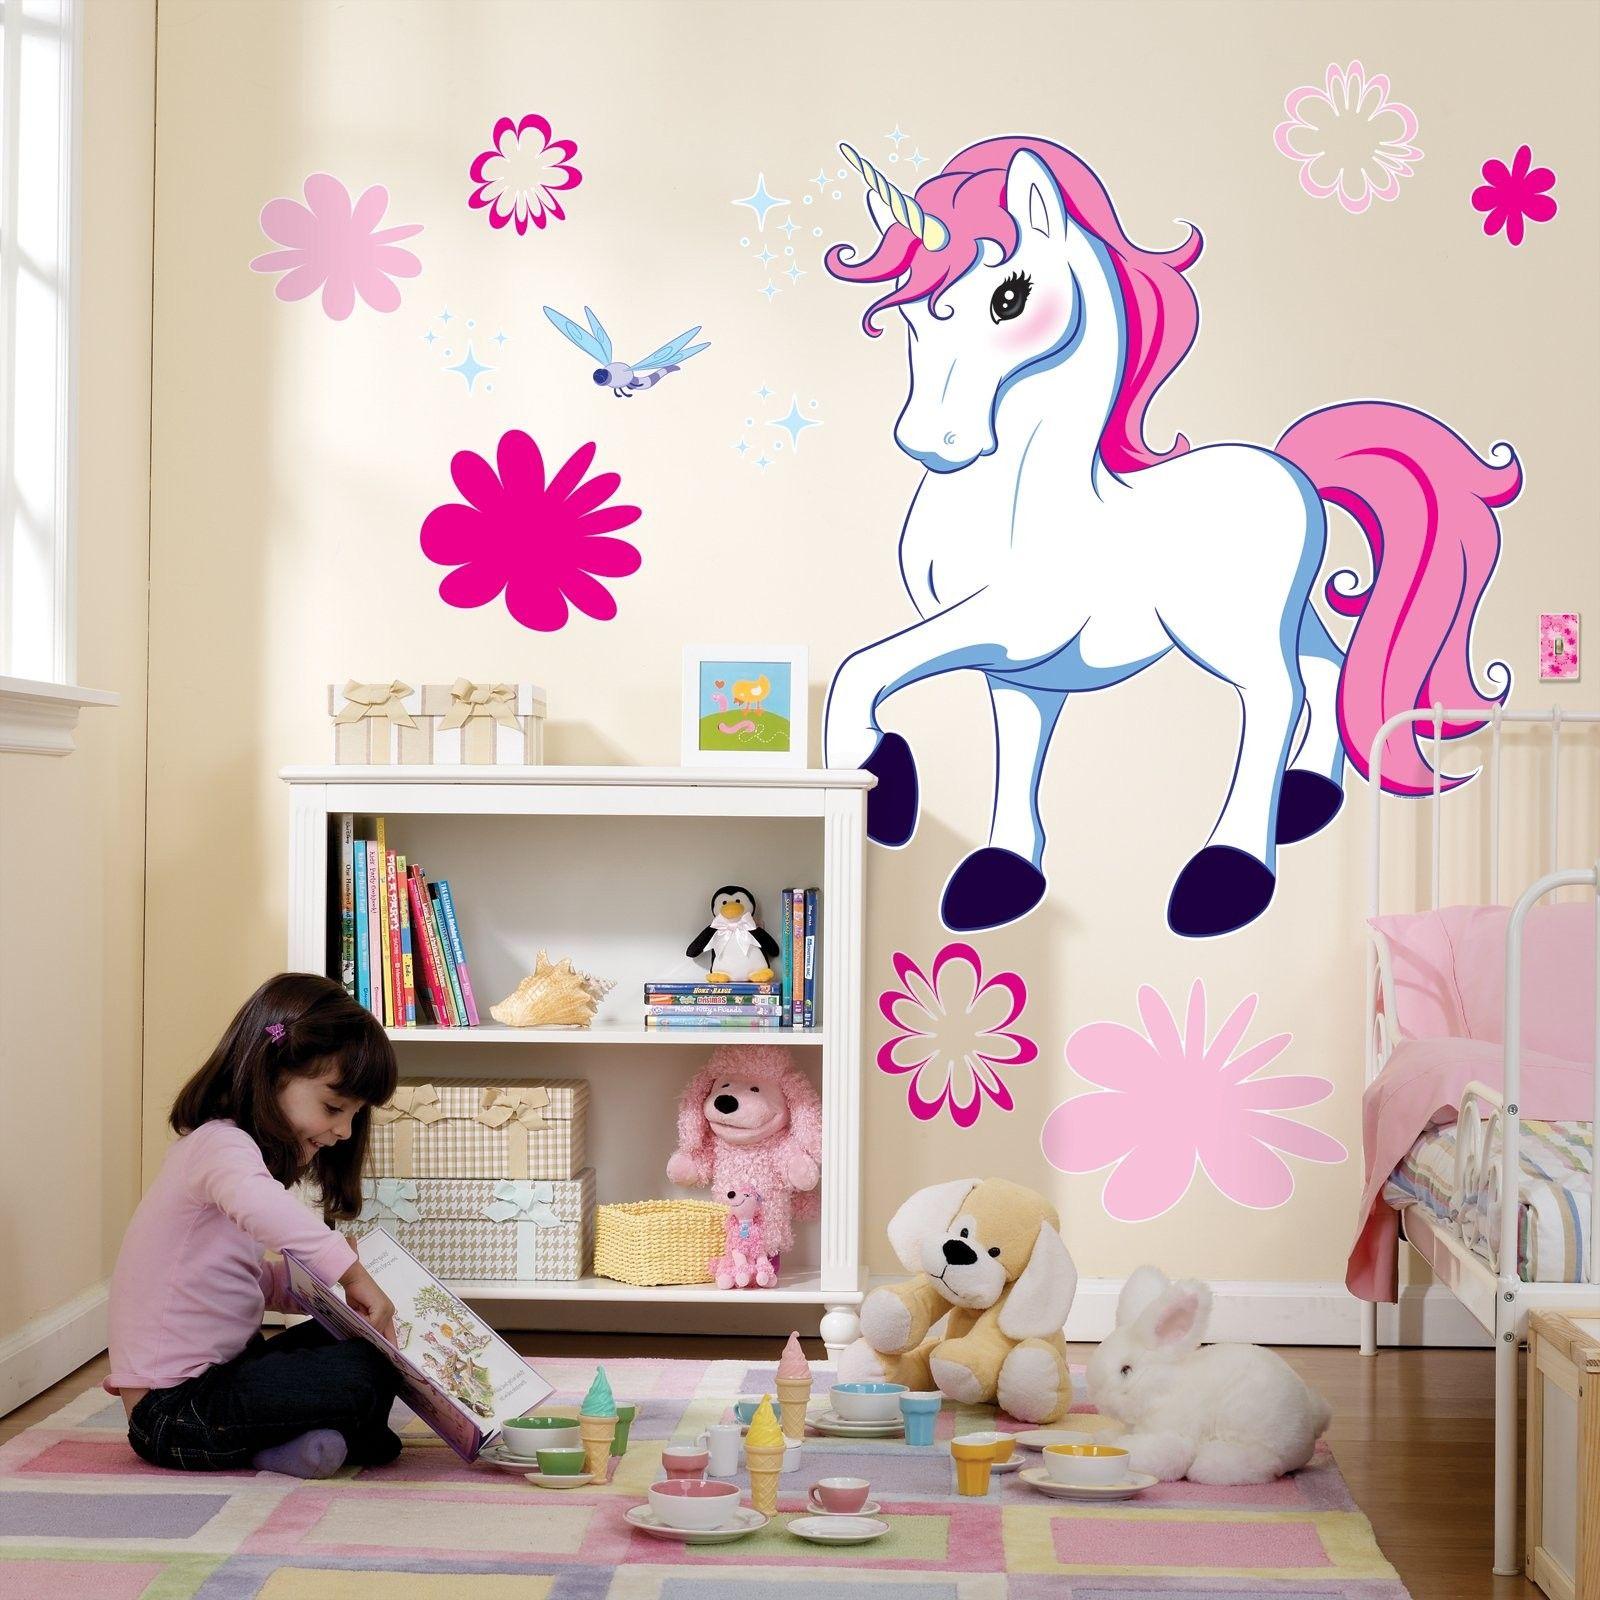 Wall Decal Sticker Bedroom Unicorn Magic Horse Dream Cartoon Kids Girls Boys Teenager Room 408b